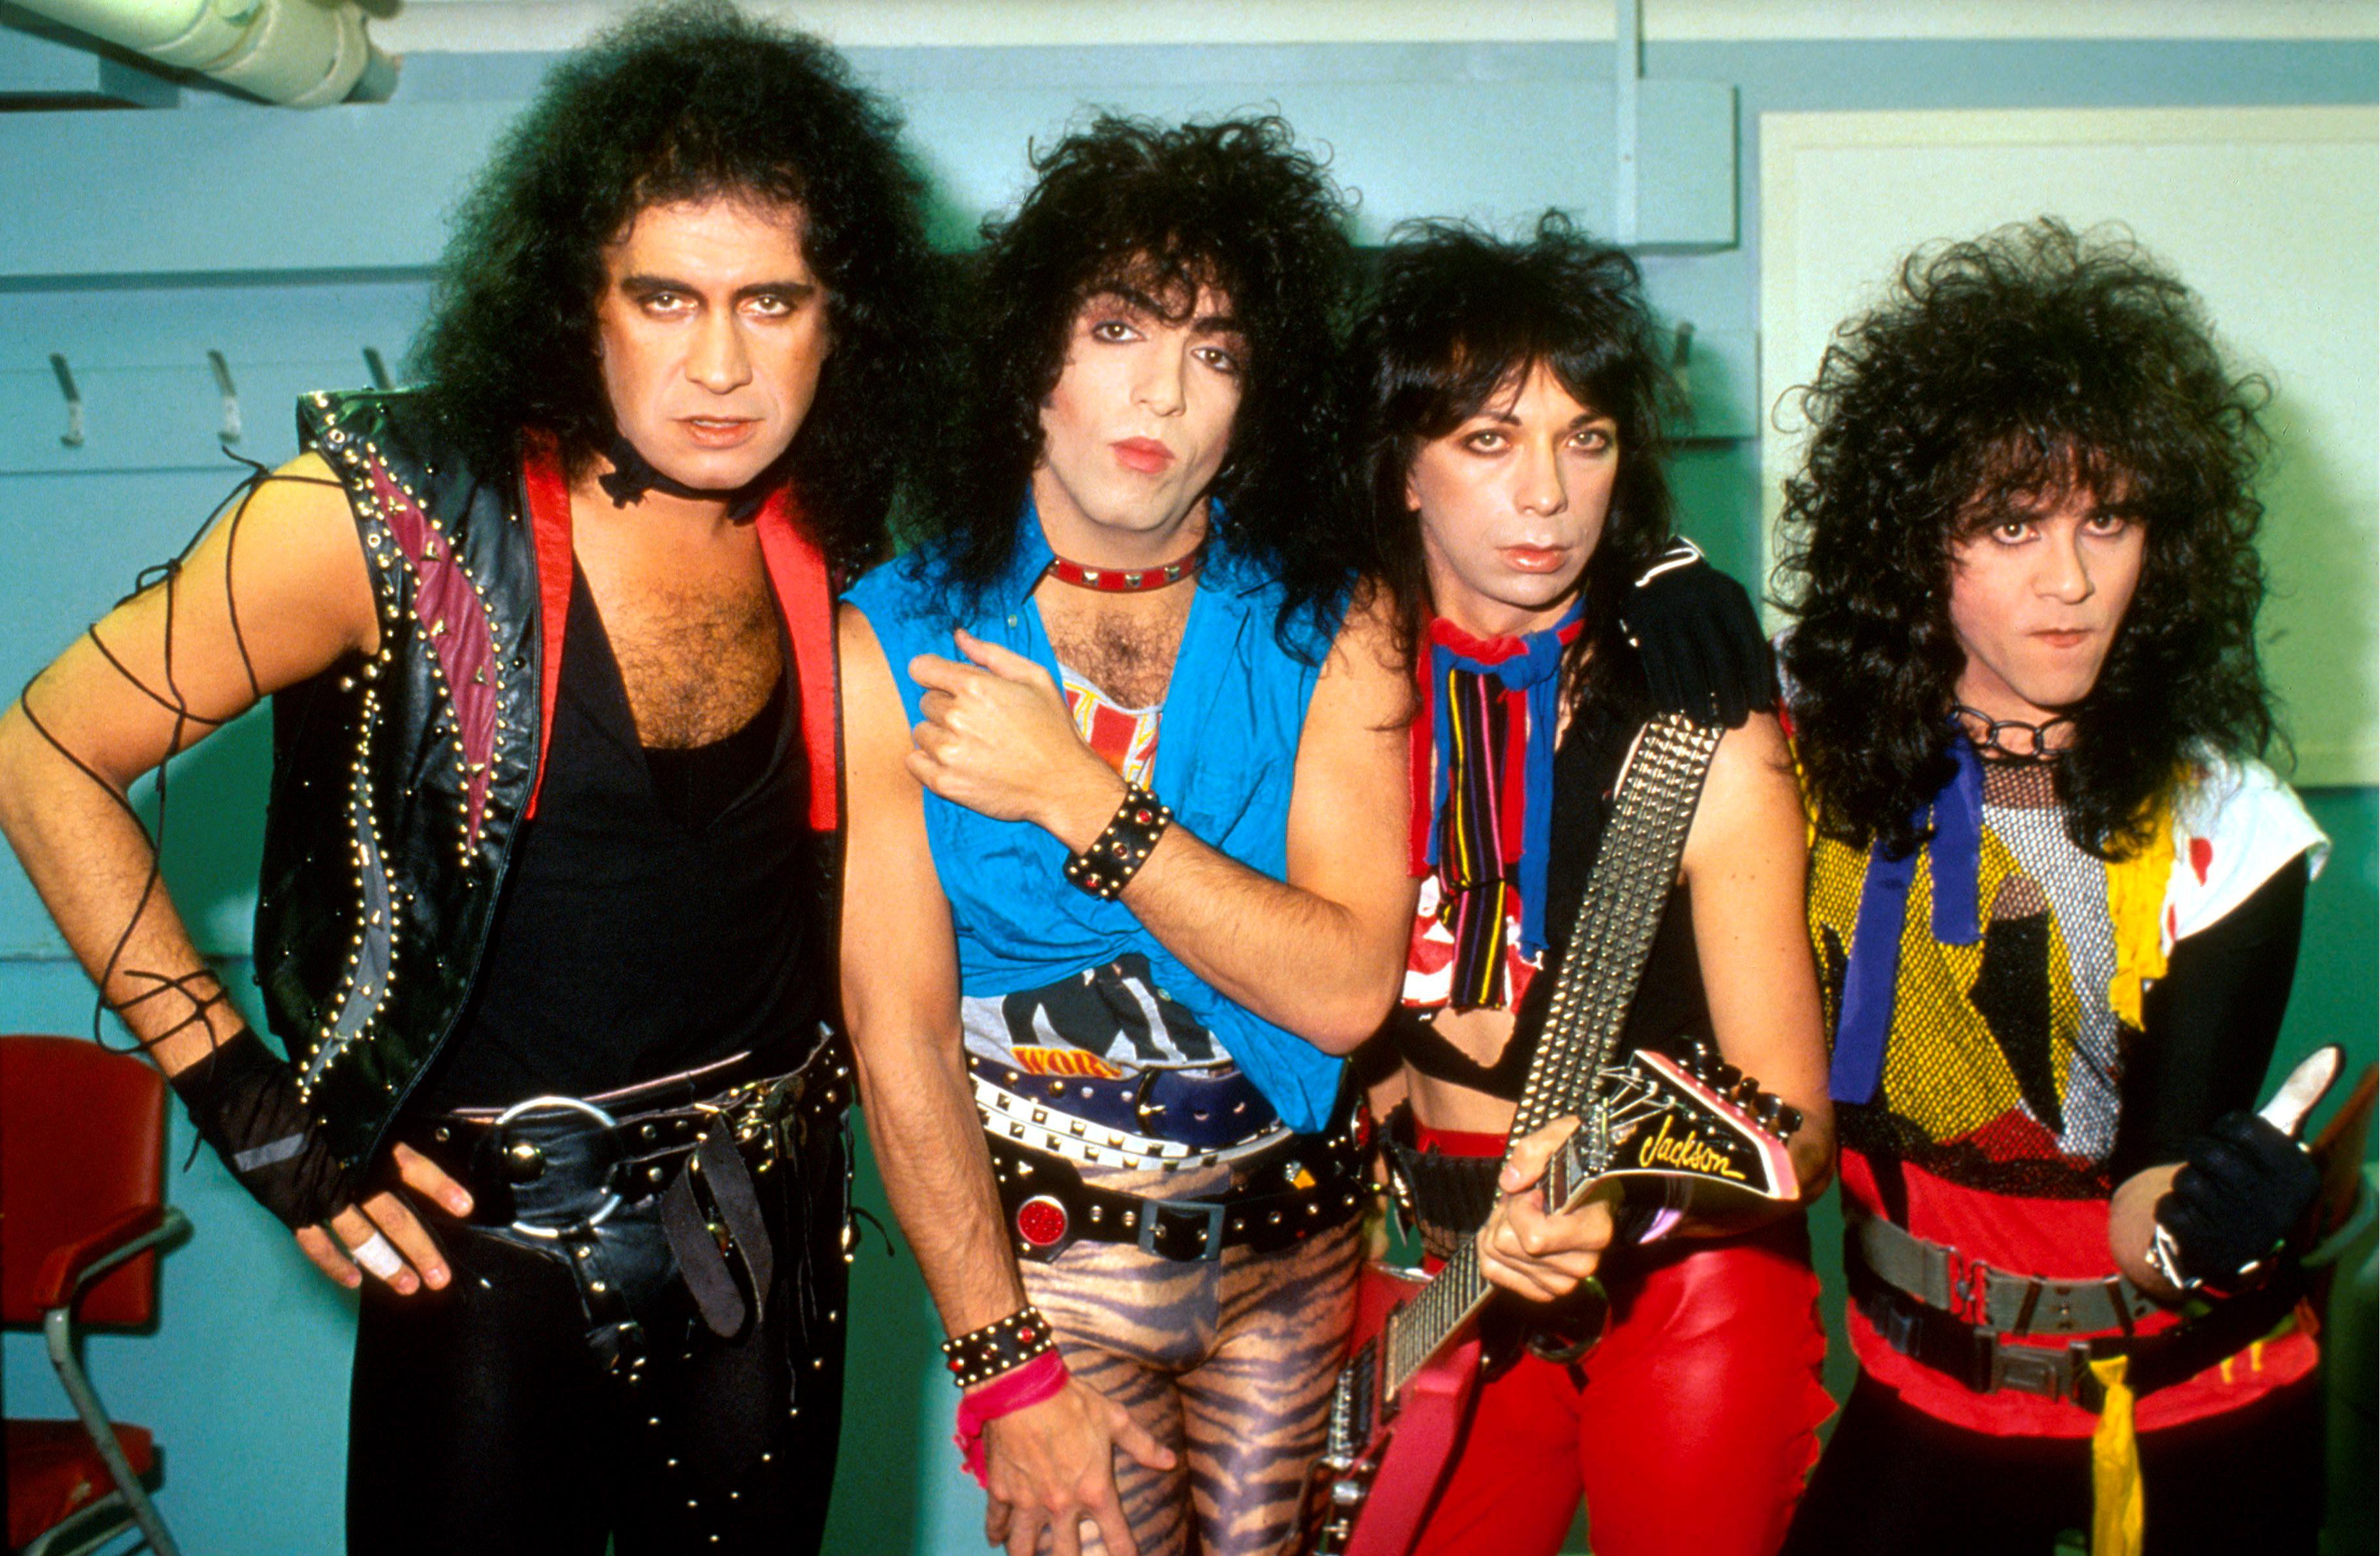 Kiss, group portrait, without make up, London, August 1983, L-R Gene Simmons, Paul Stanley, Vinnie Vincent, Eric Carr. (Photo